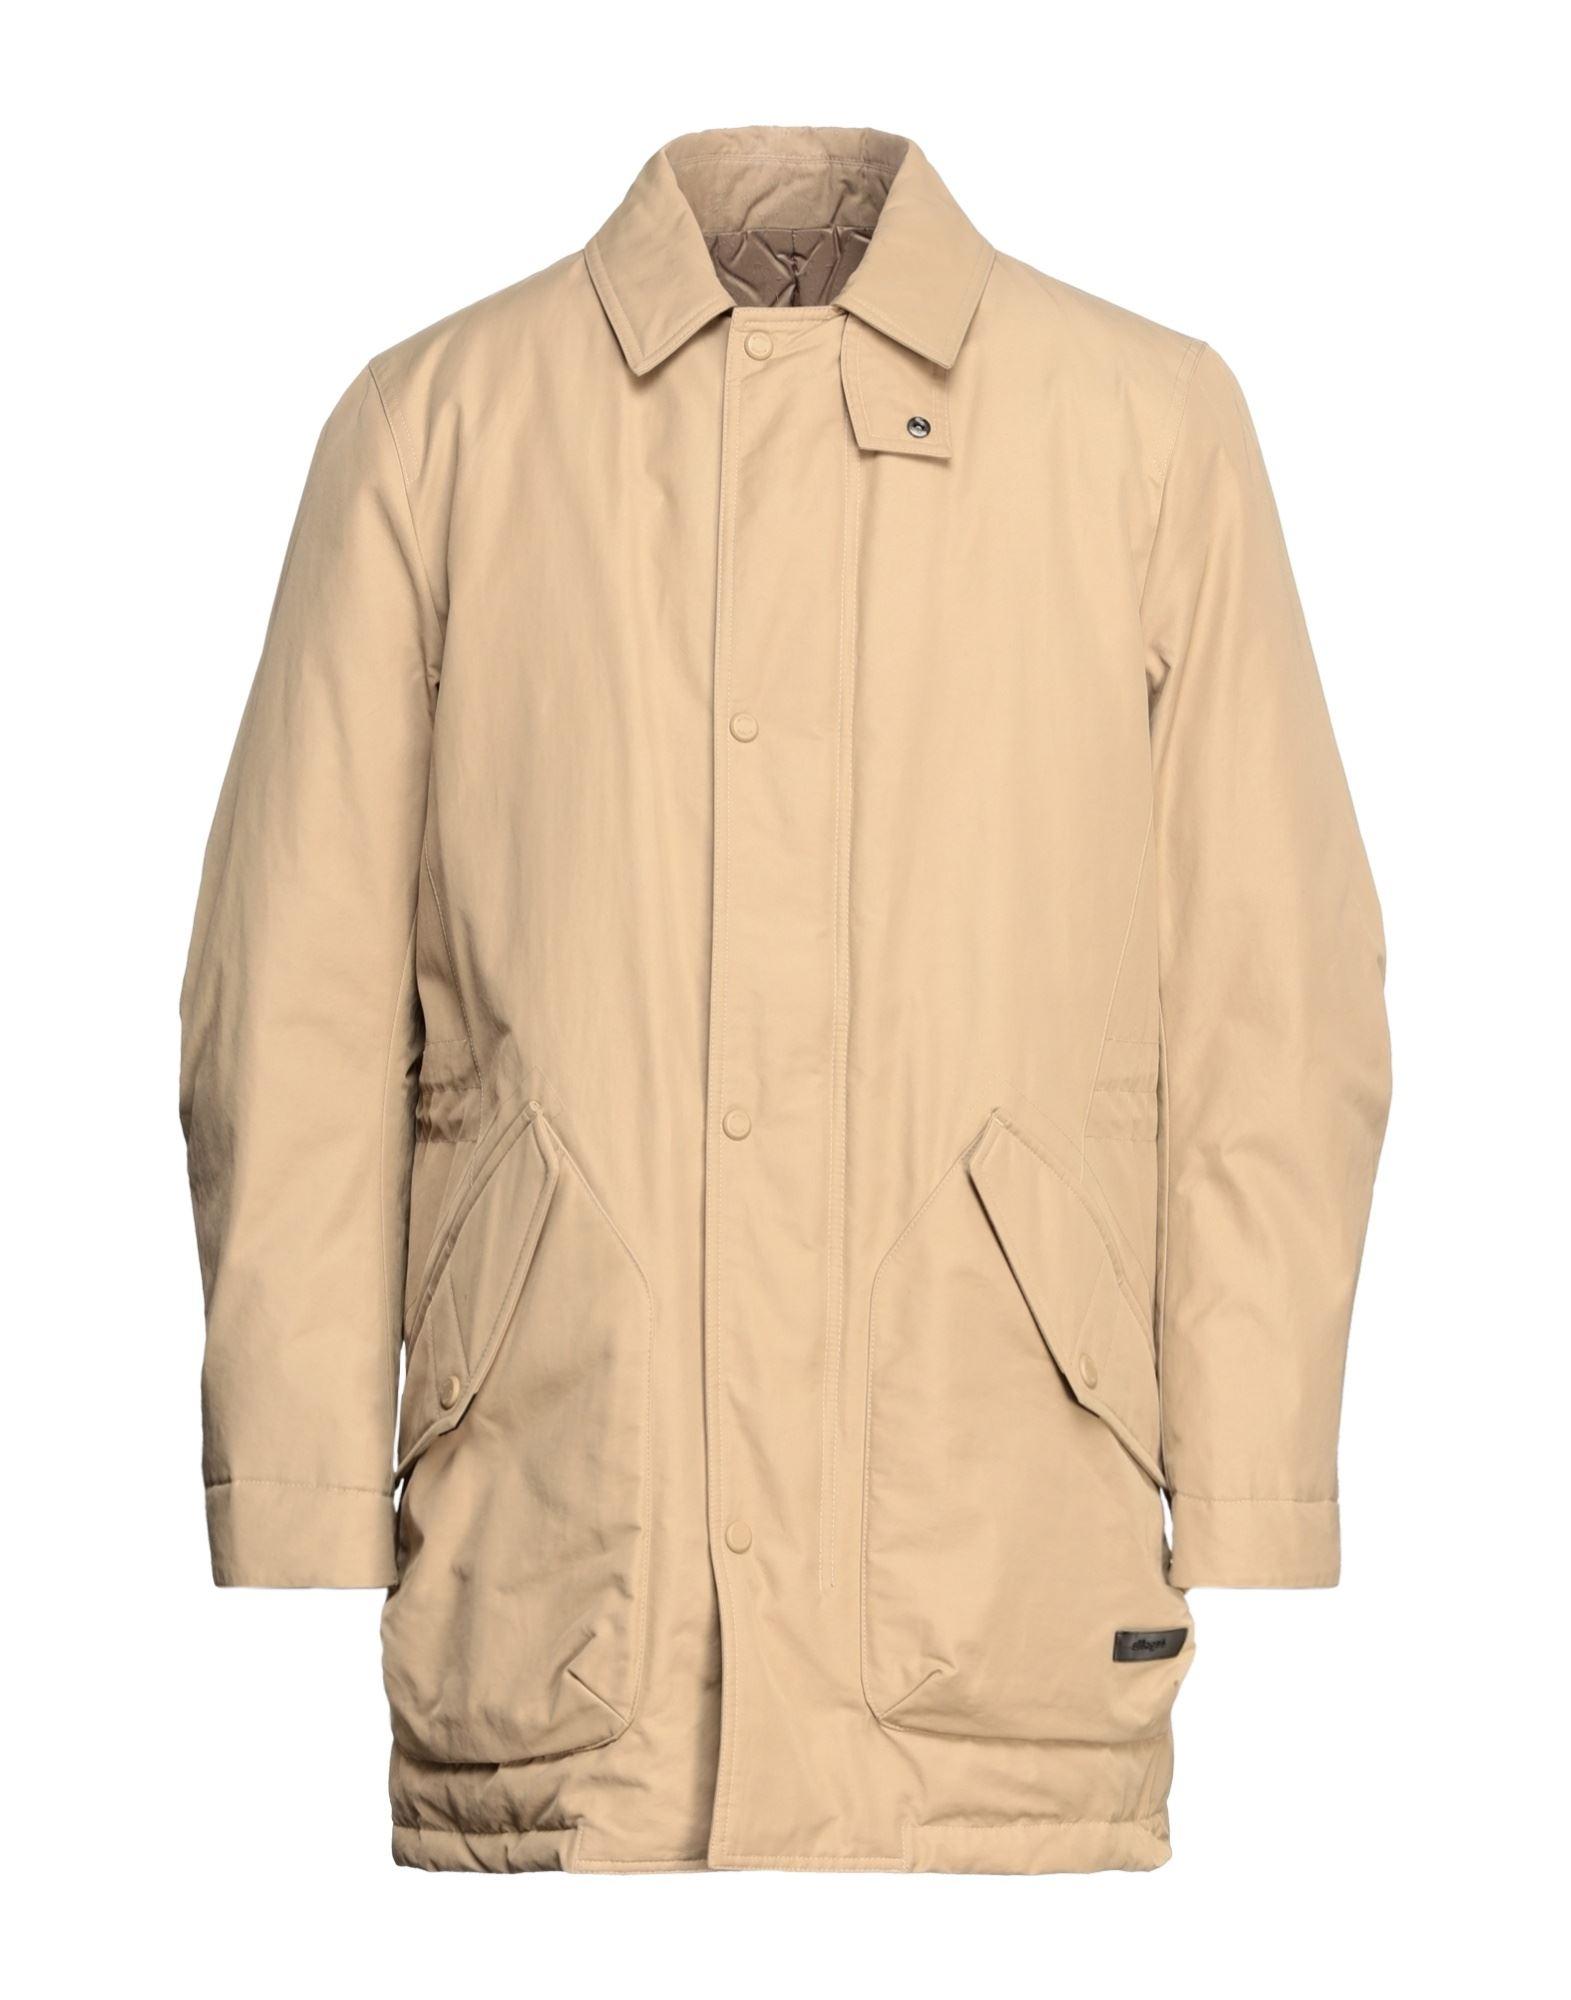 ALLEGRI Overcoats - Item 41917347